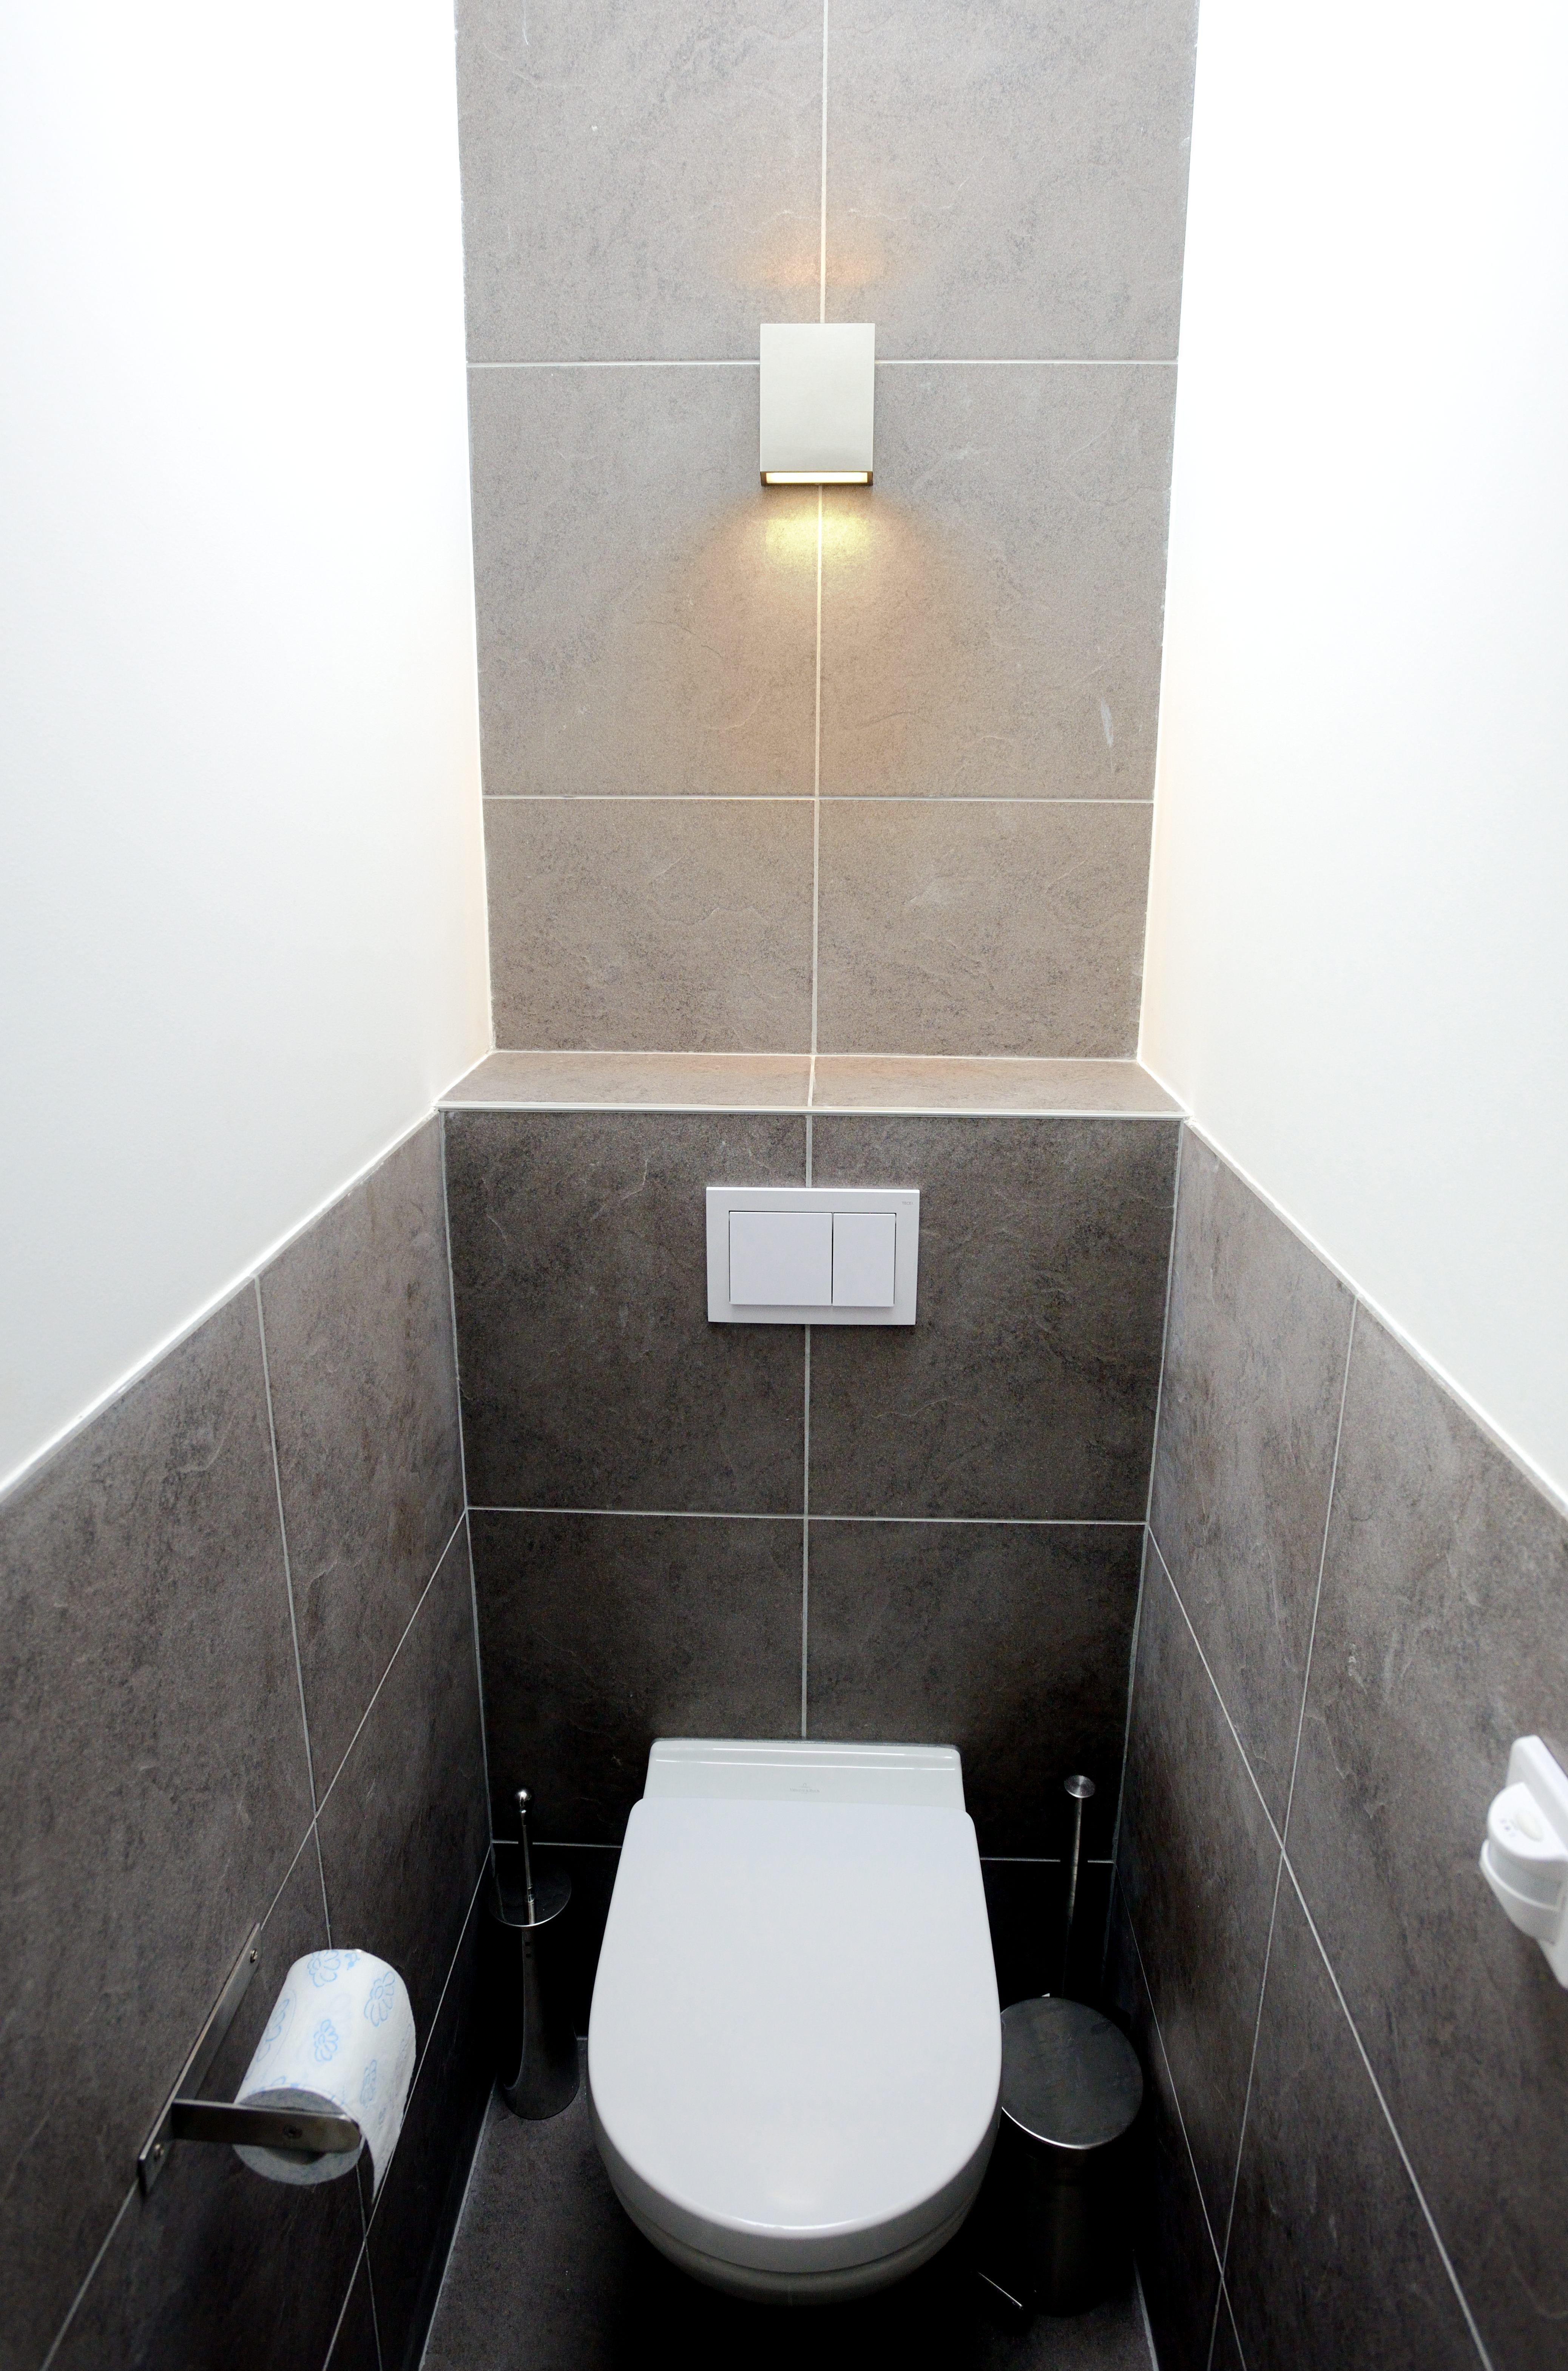 Toilet Villa Hilversum Toilet Villa Renovatie